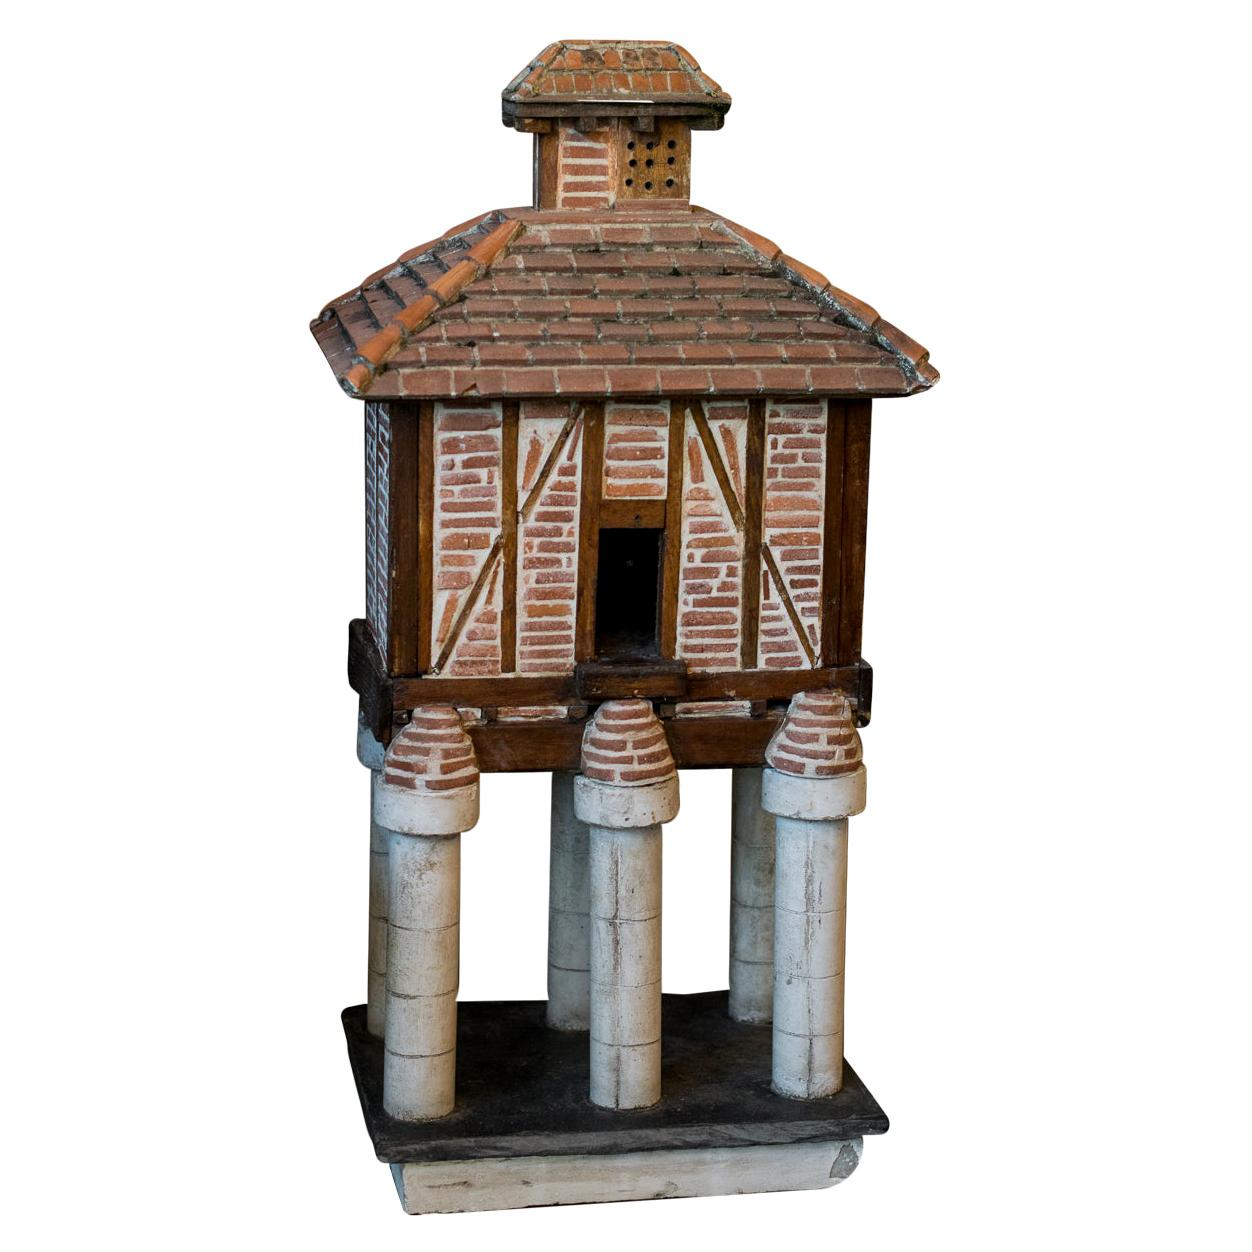 French Folk Art Terracotta Birdhouse on Pillars